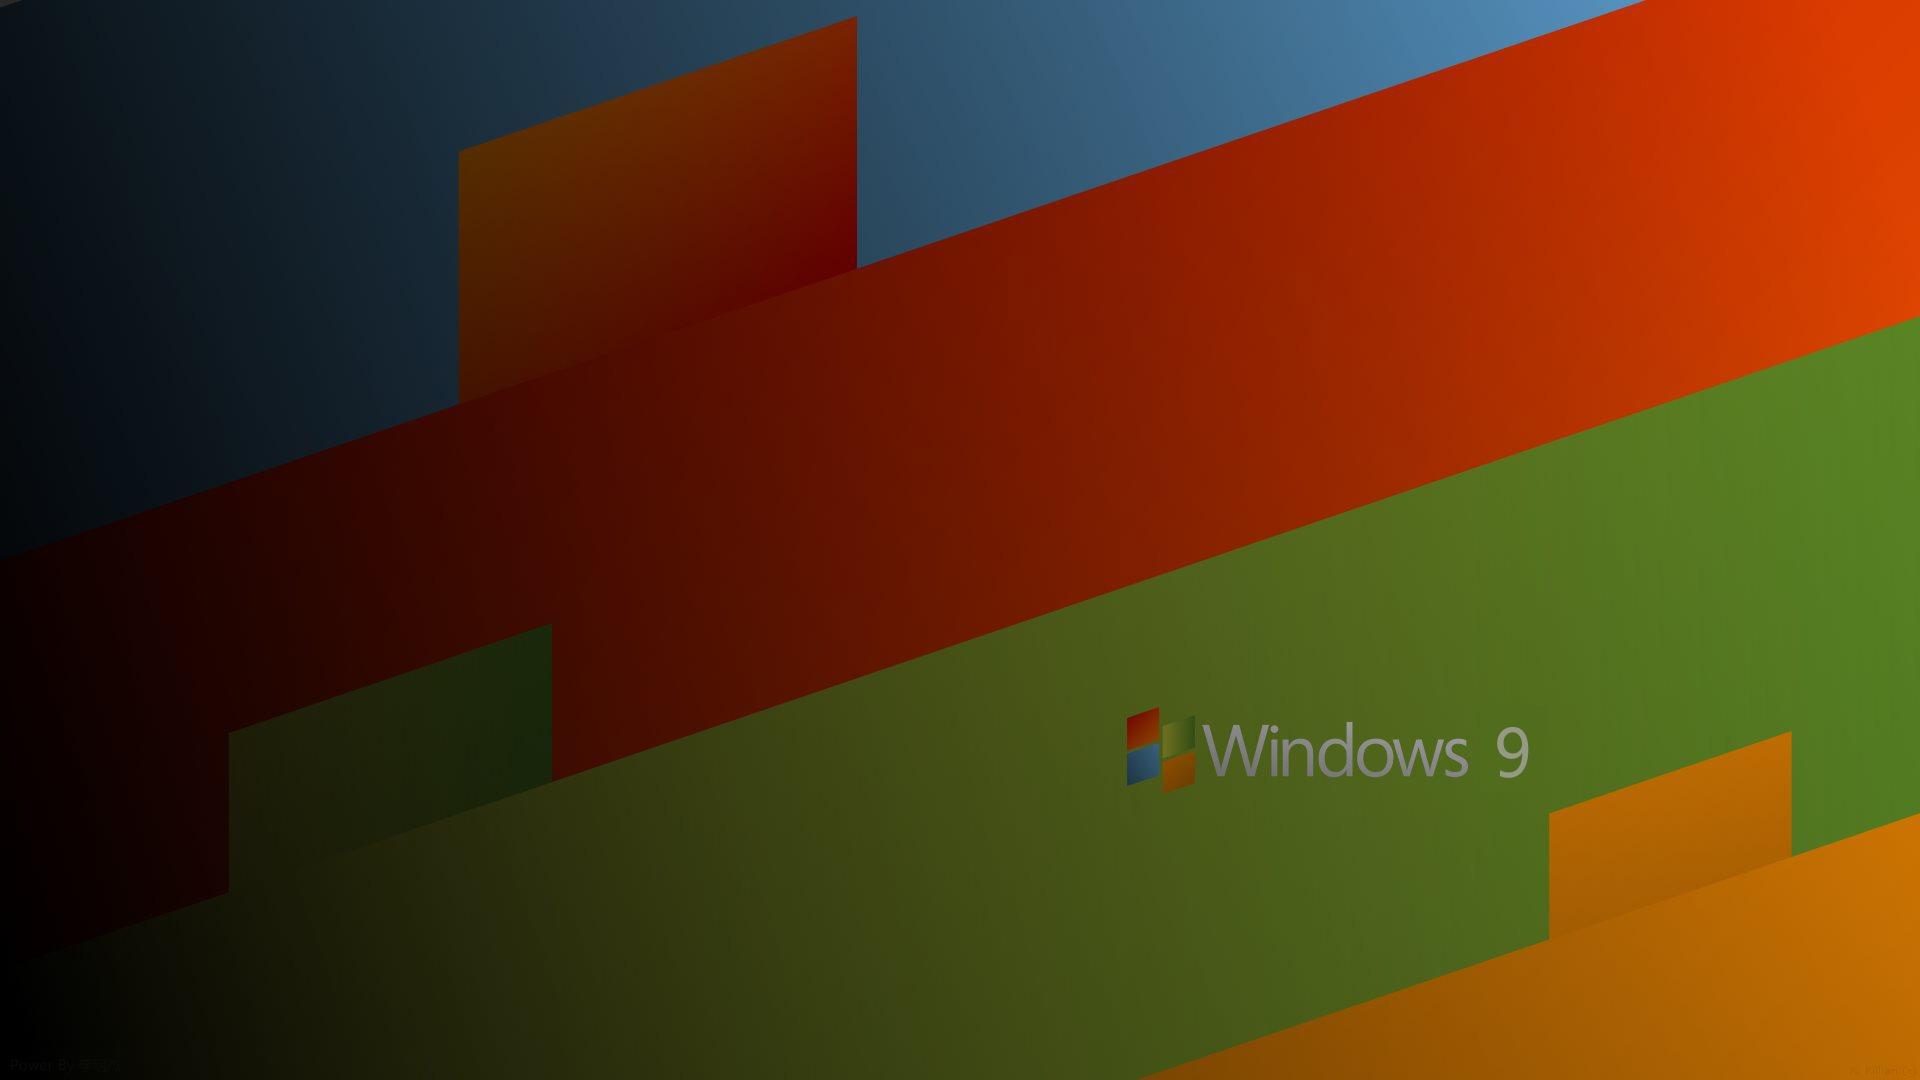 Nike Wallpaper Iphone 6s Microsoft Windows 9 Hd Widescreen Wallpaper 09 1920x1080